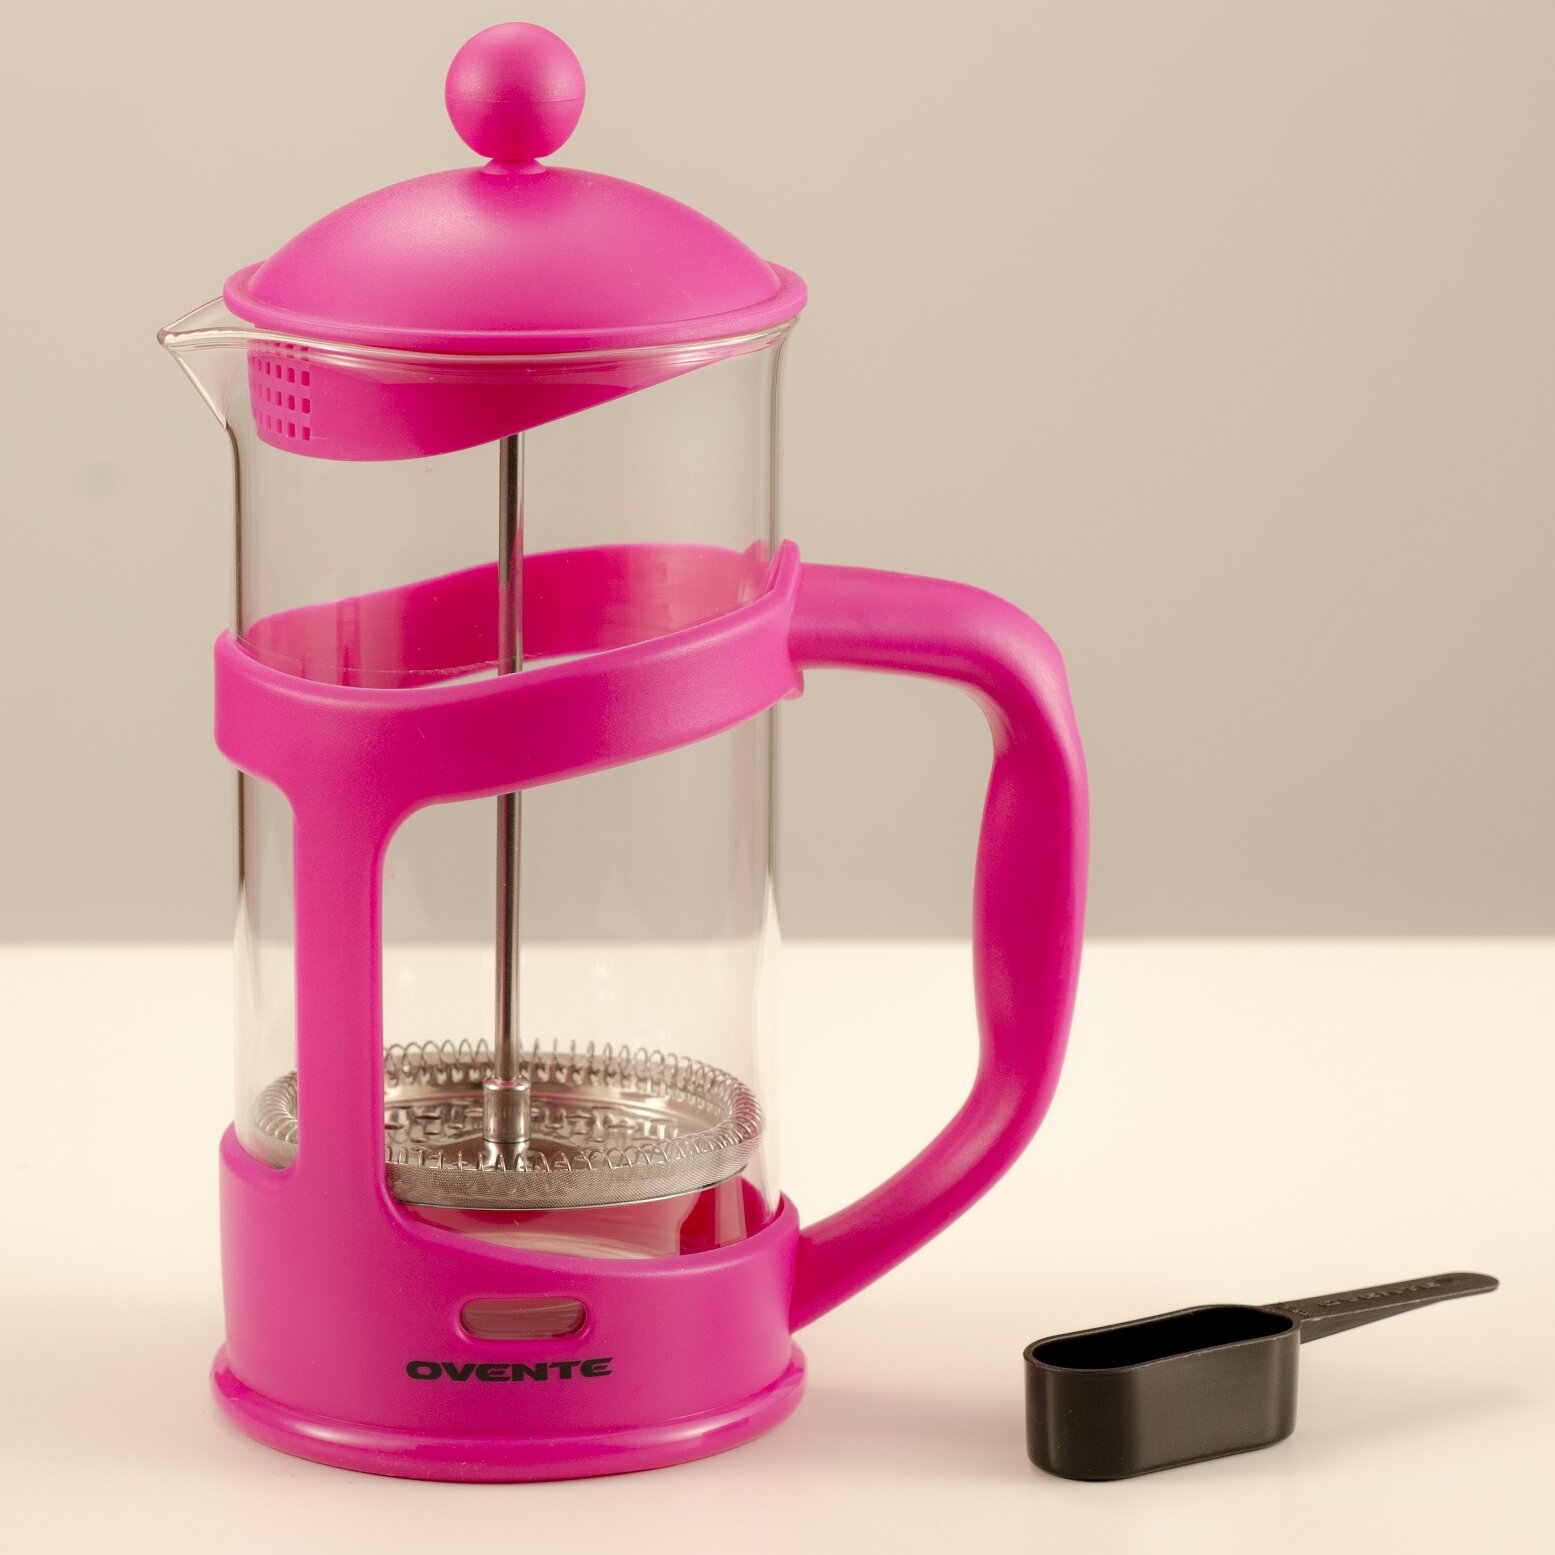 French Press Coffee Maker Automatic : Ovente 34 Oz. French Press Coffee Maker eBay